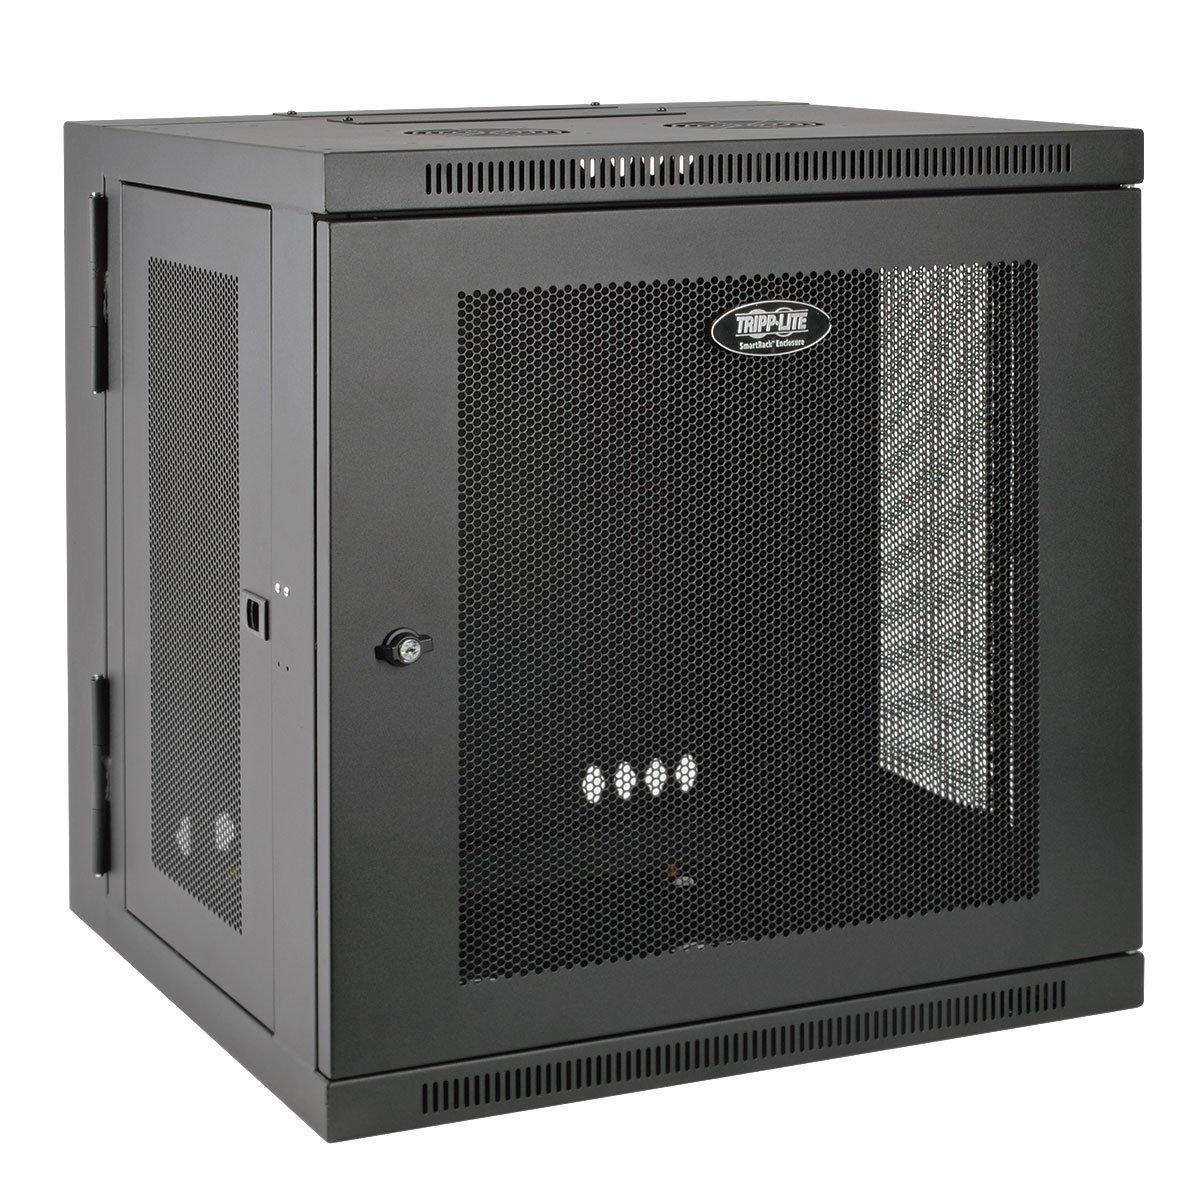 Tripp Lite 12U Wall Mount Rack Enclosure Server Cabinet, Hinged, 20.5'' Deep, Switch-Depth (SRW12US) by Tripp Lite